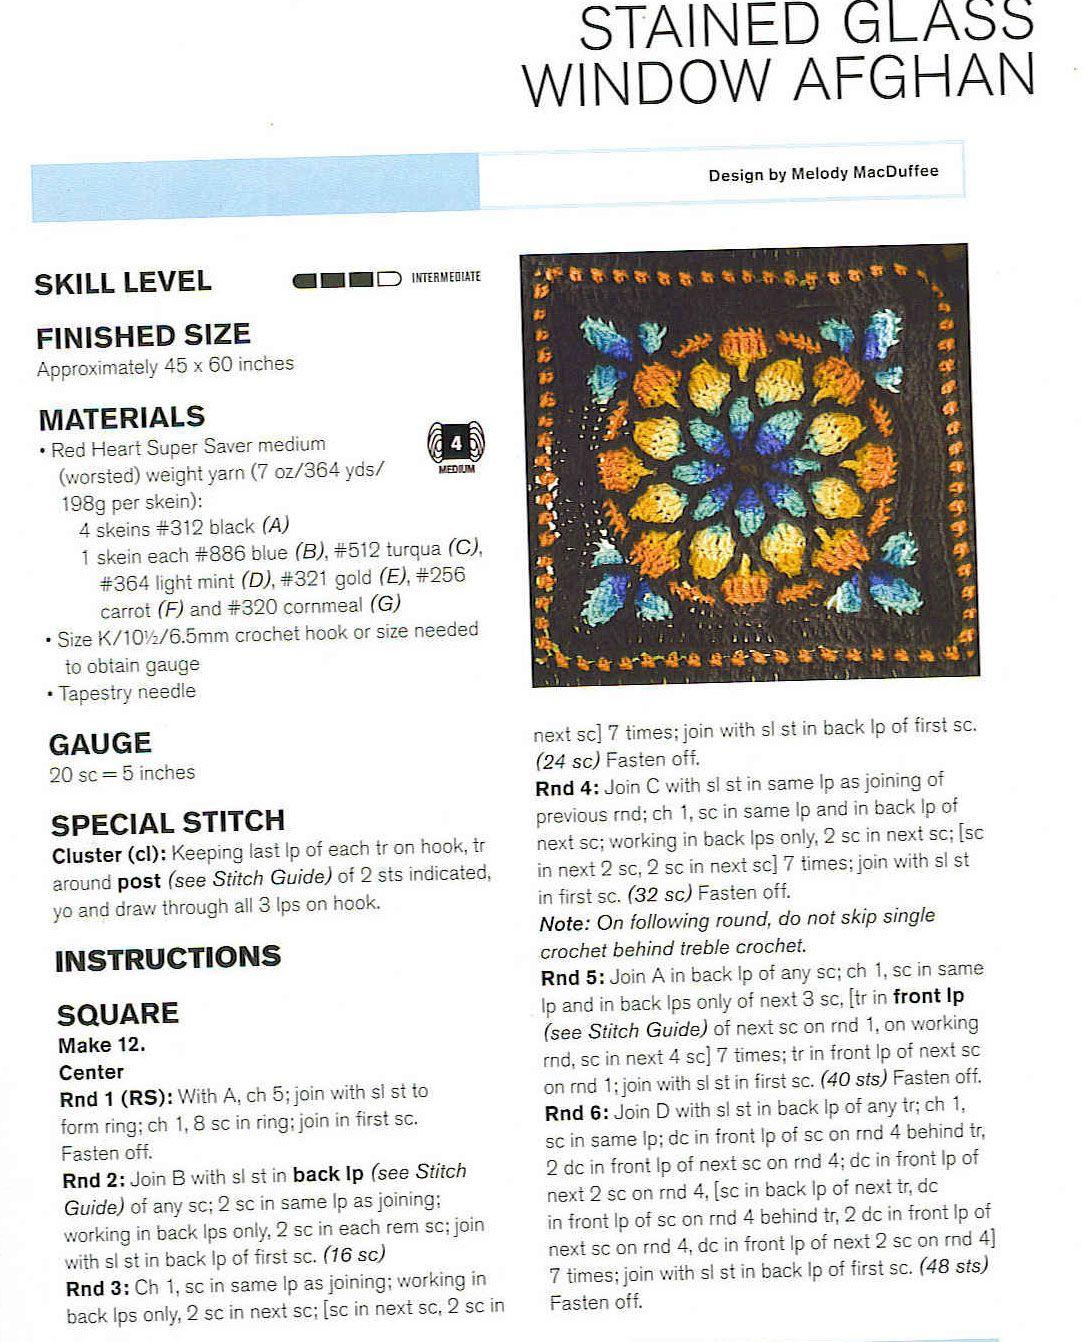 Stained Glass Window Crochet Squares Blanket Jpg 1 089 1 342